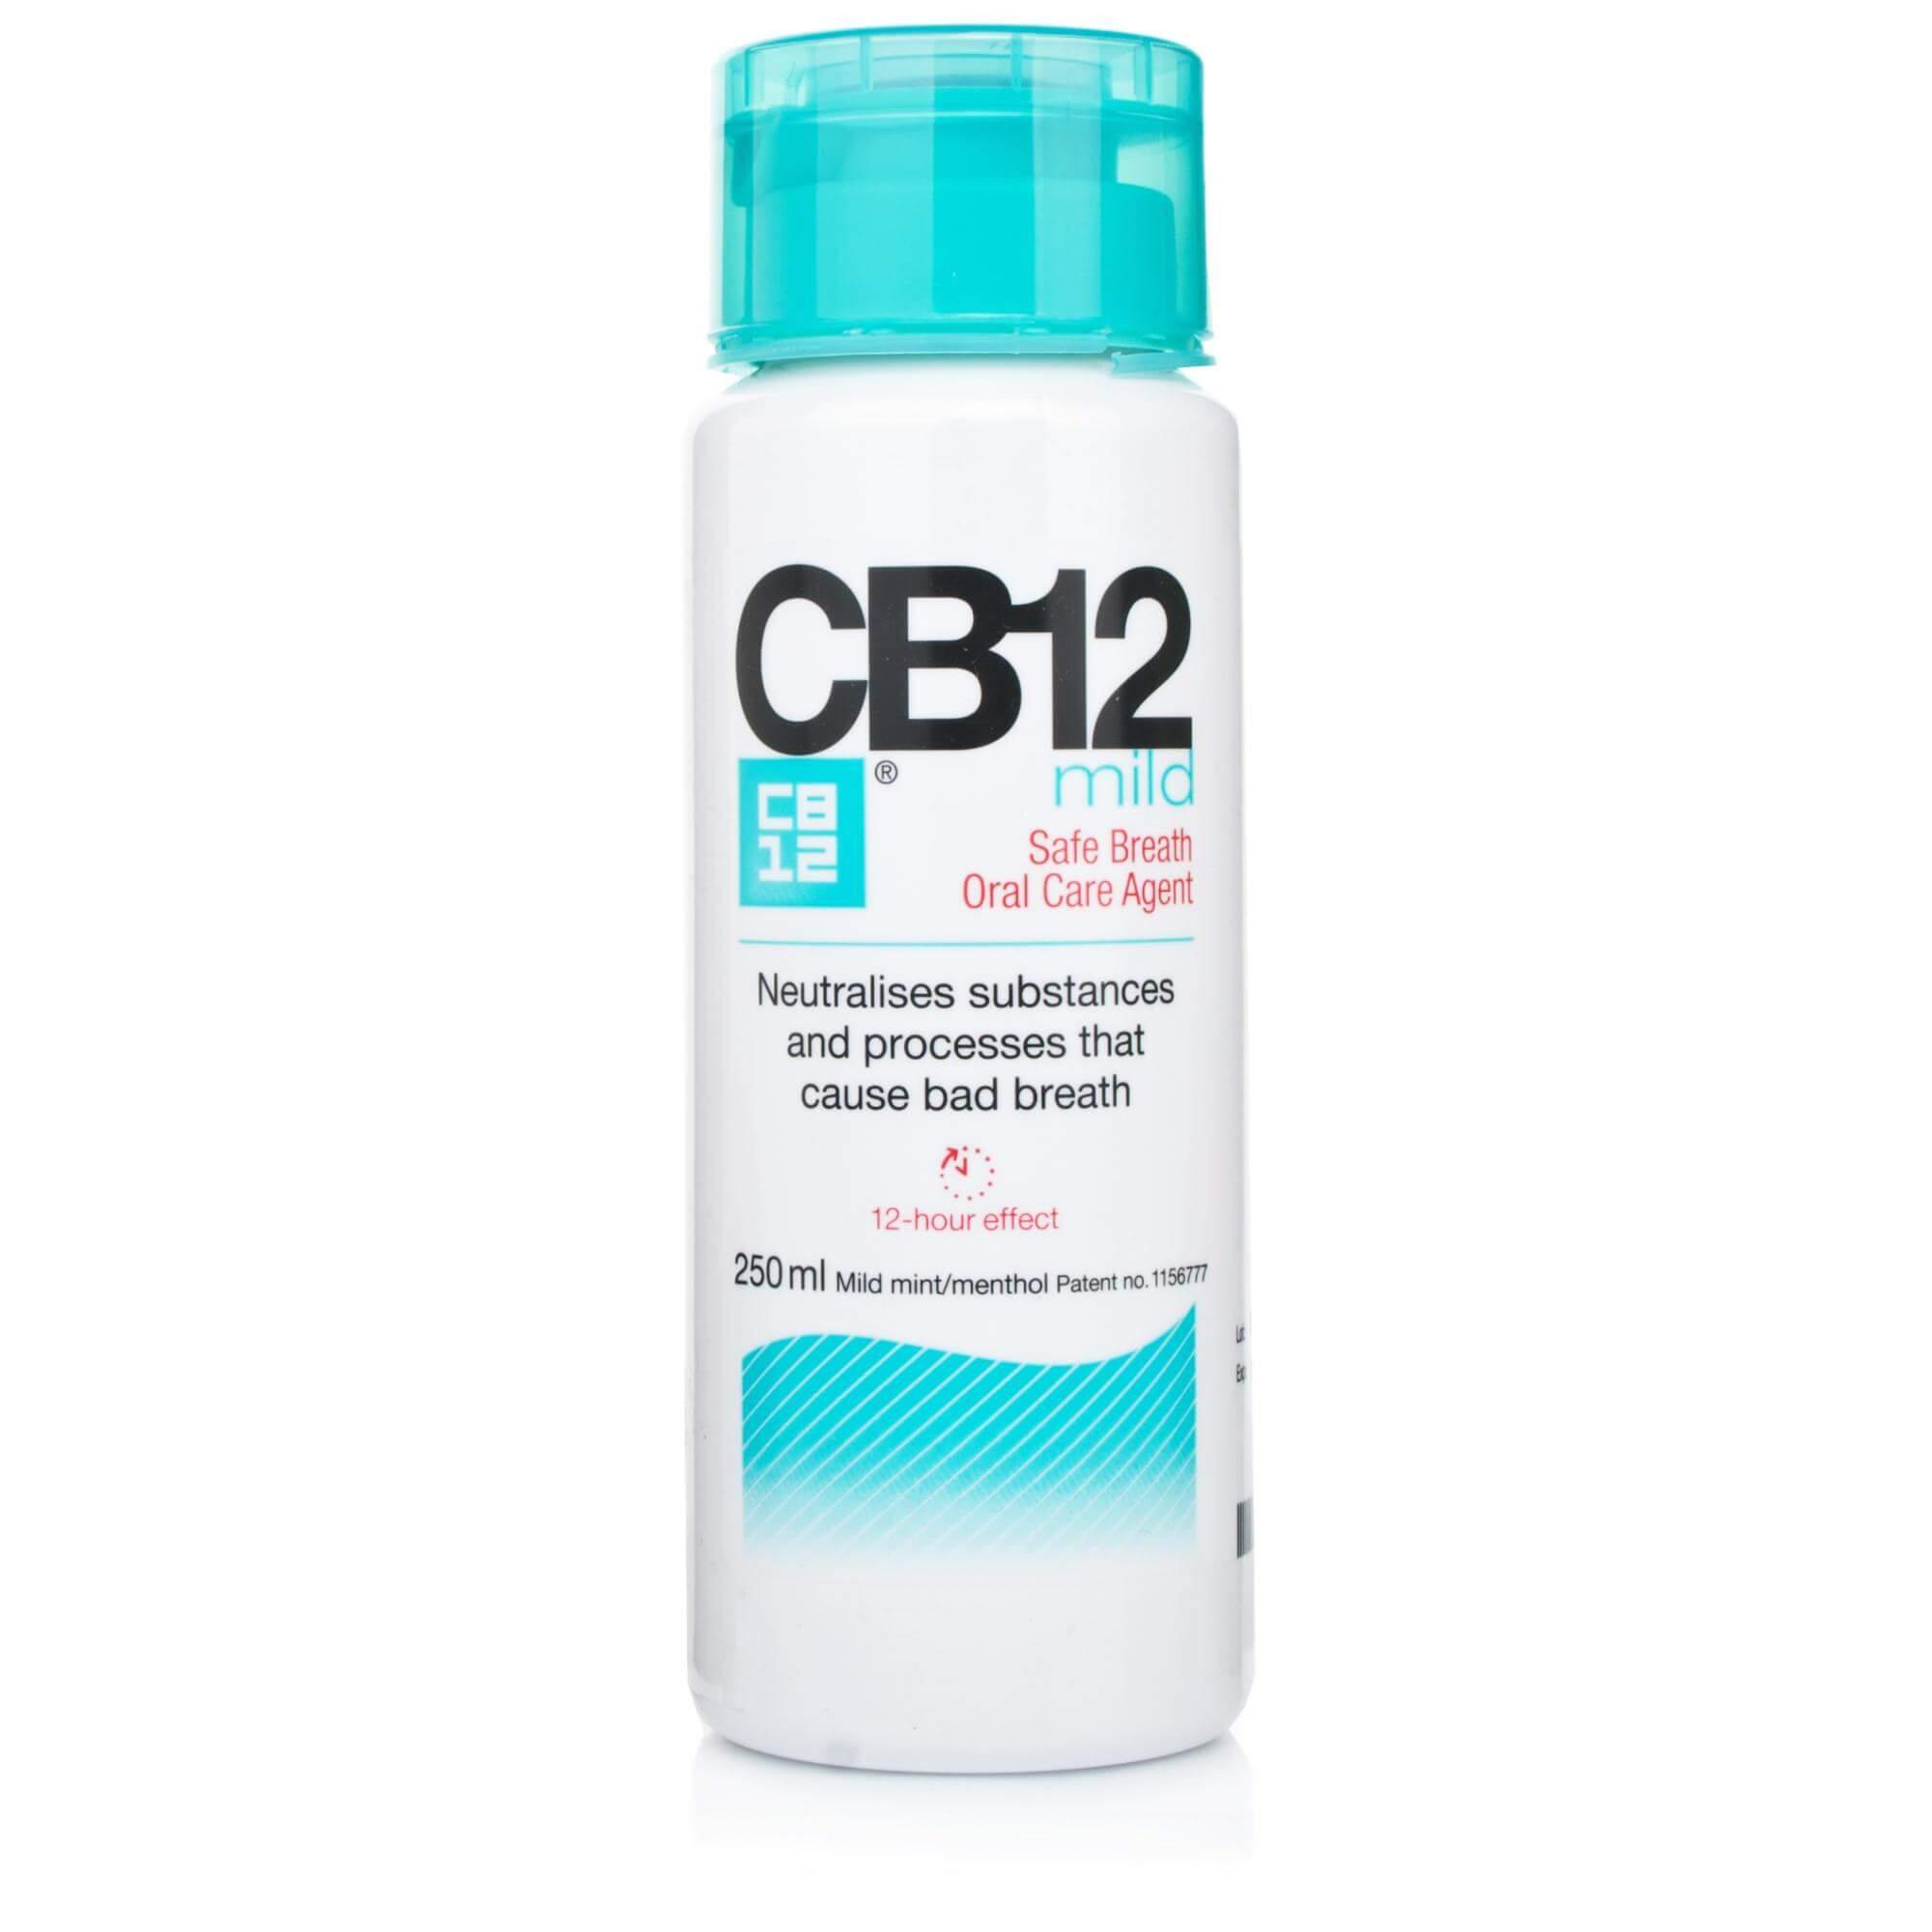 CB12 Στοματικό Διάλυμα για Ασφαλή Αναπνοή με Ήπια Γεύση Mild 250 ml